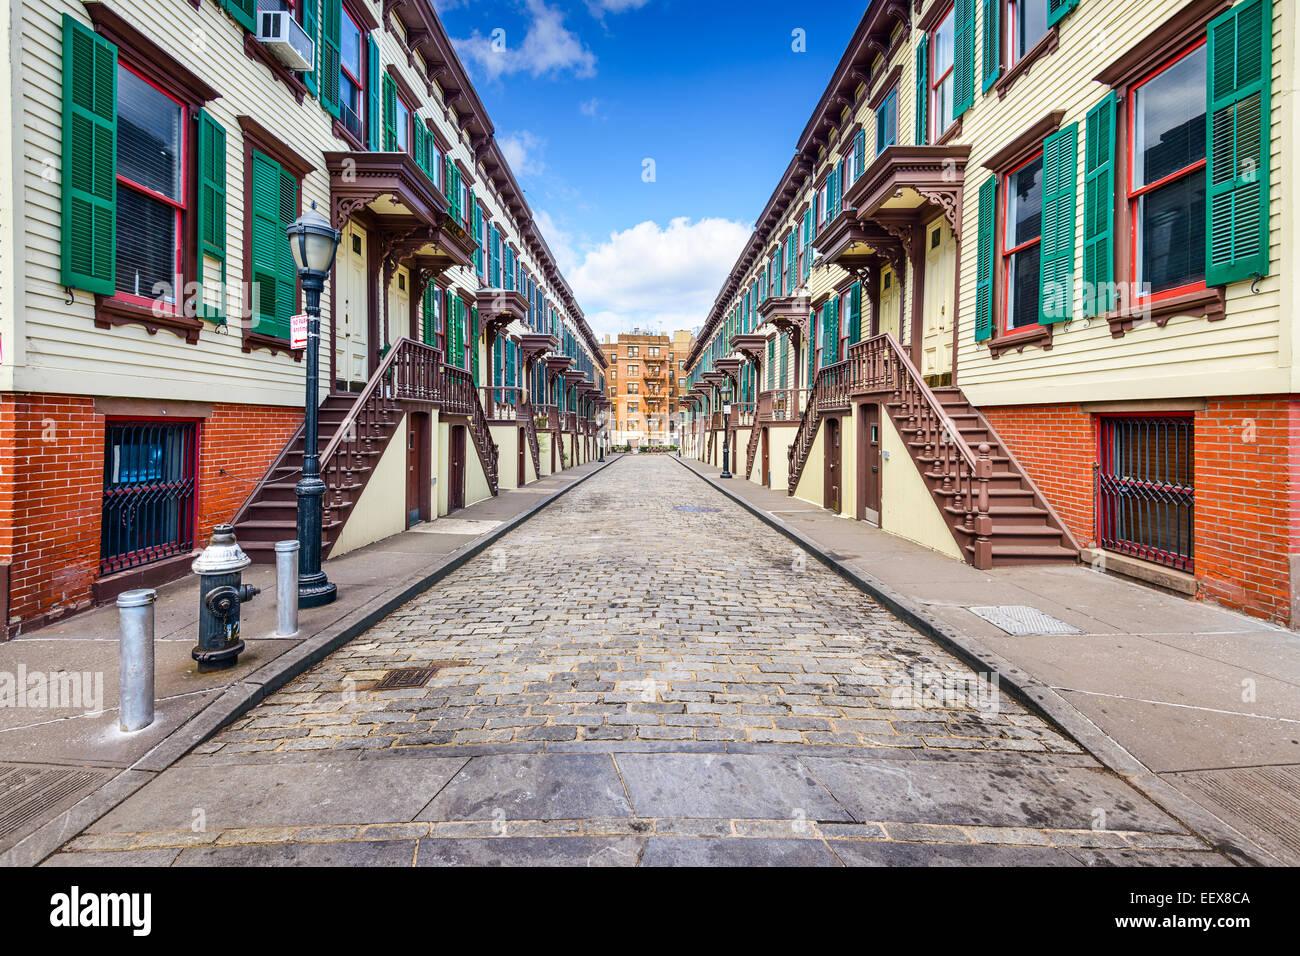 New York City, USA bei Reihenhäuser im Jumel Terrasse Historic District. Stockbild